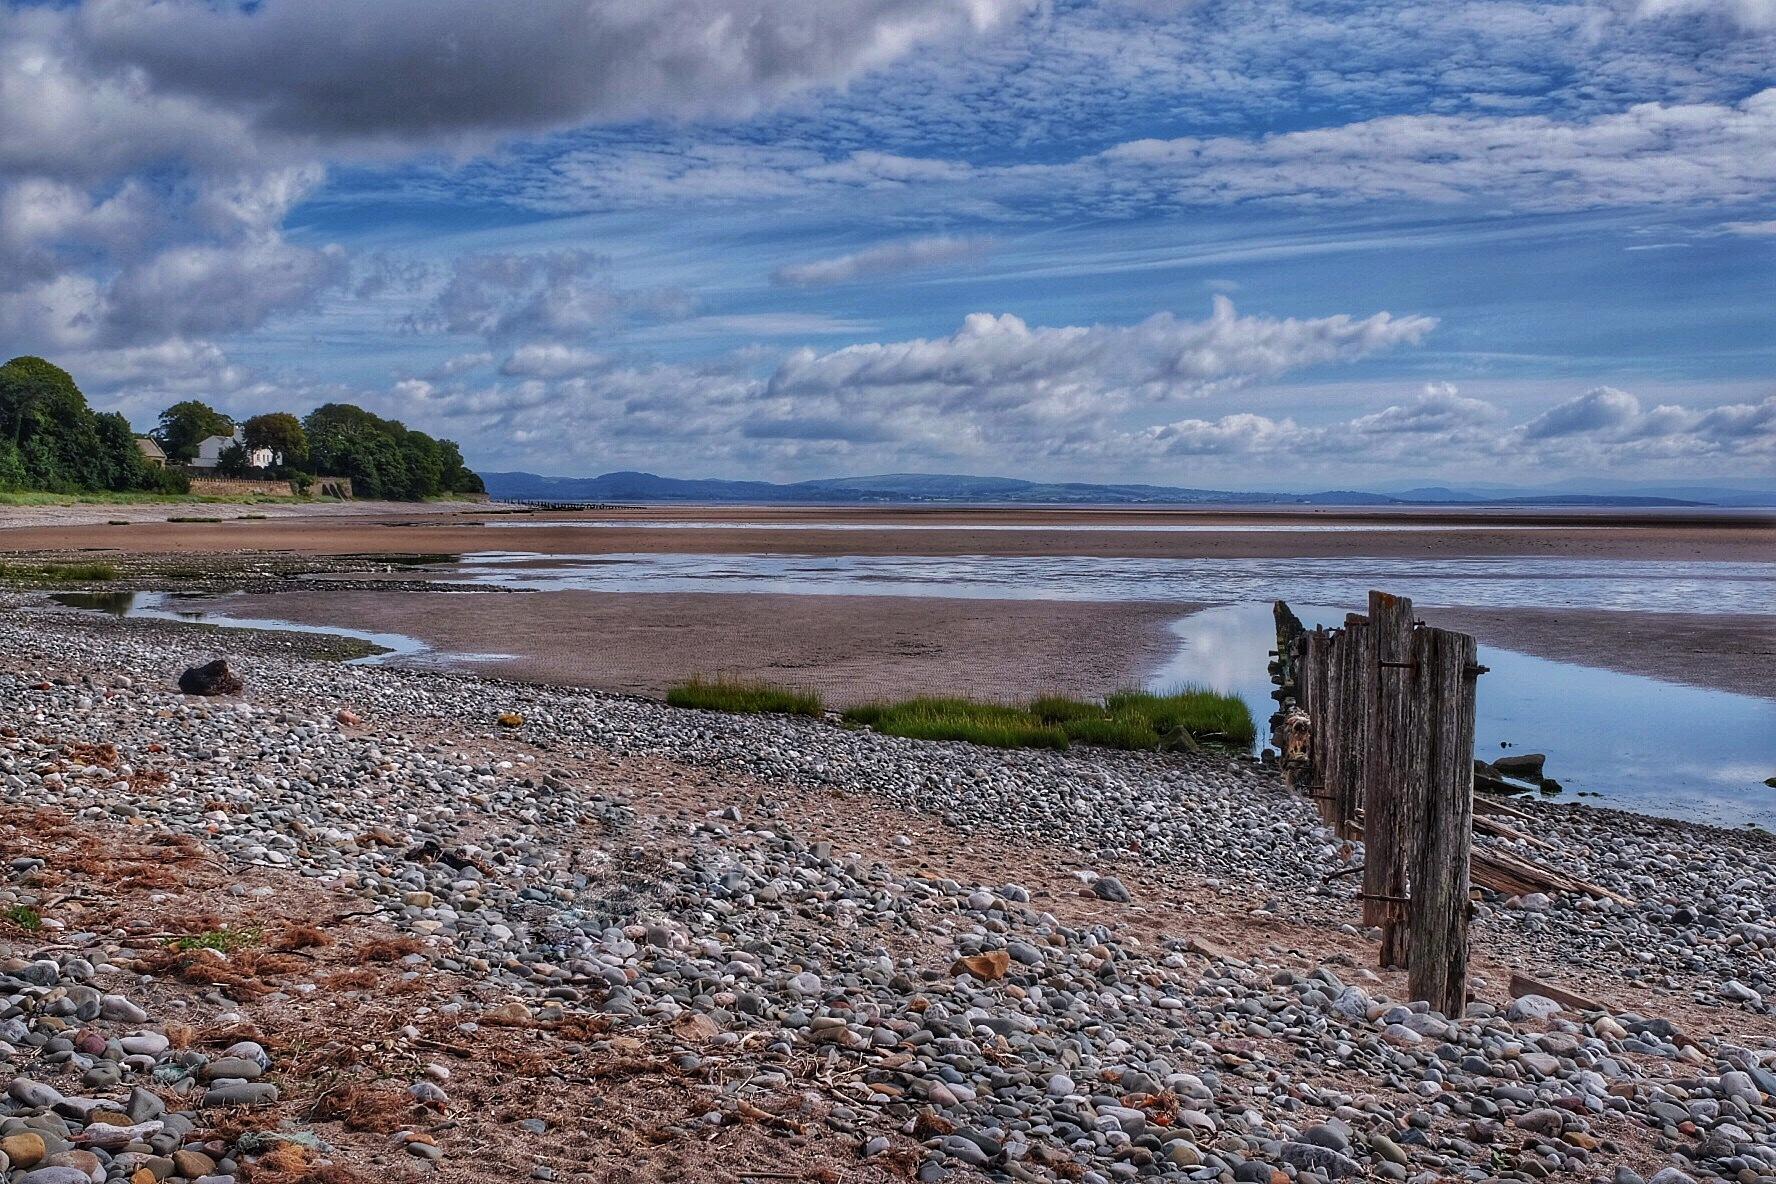 Morecambe Bay Cumbria...09080613 by Michael jjg